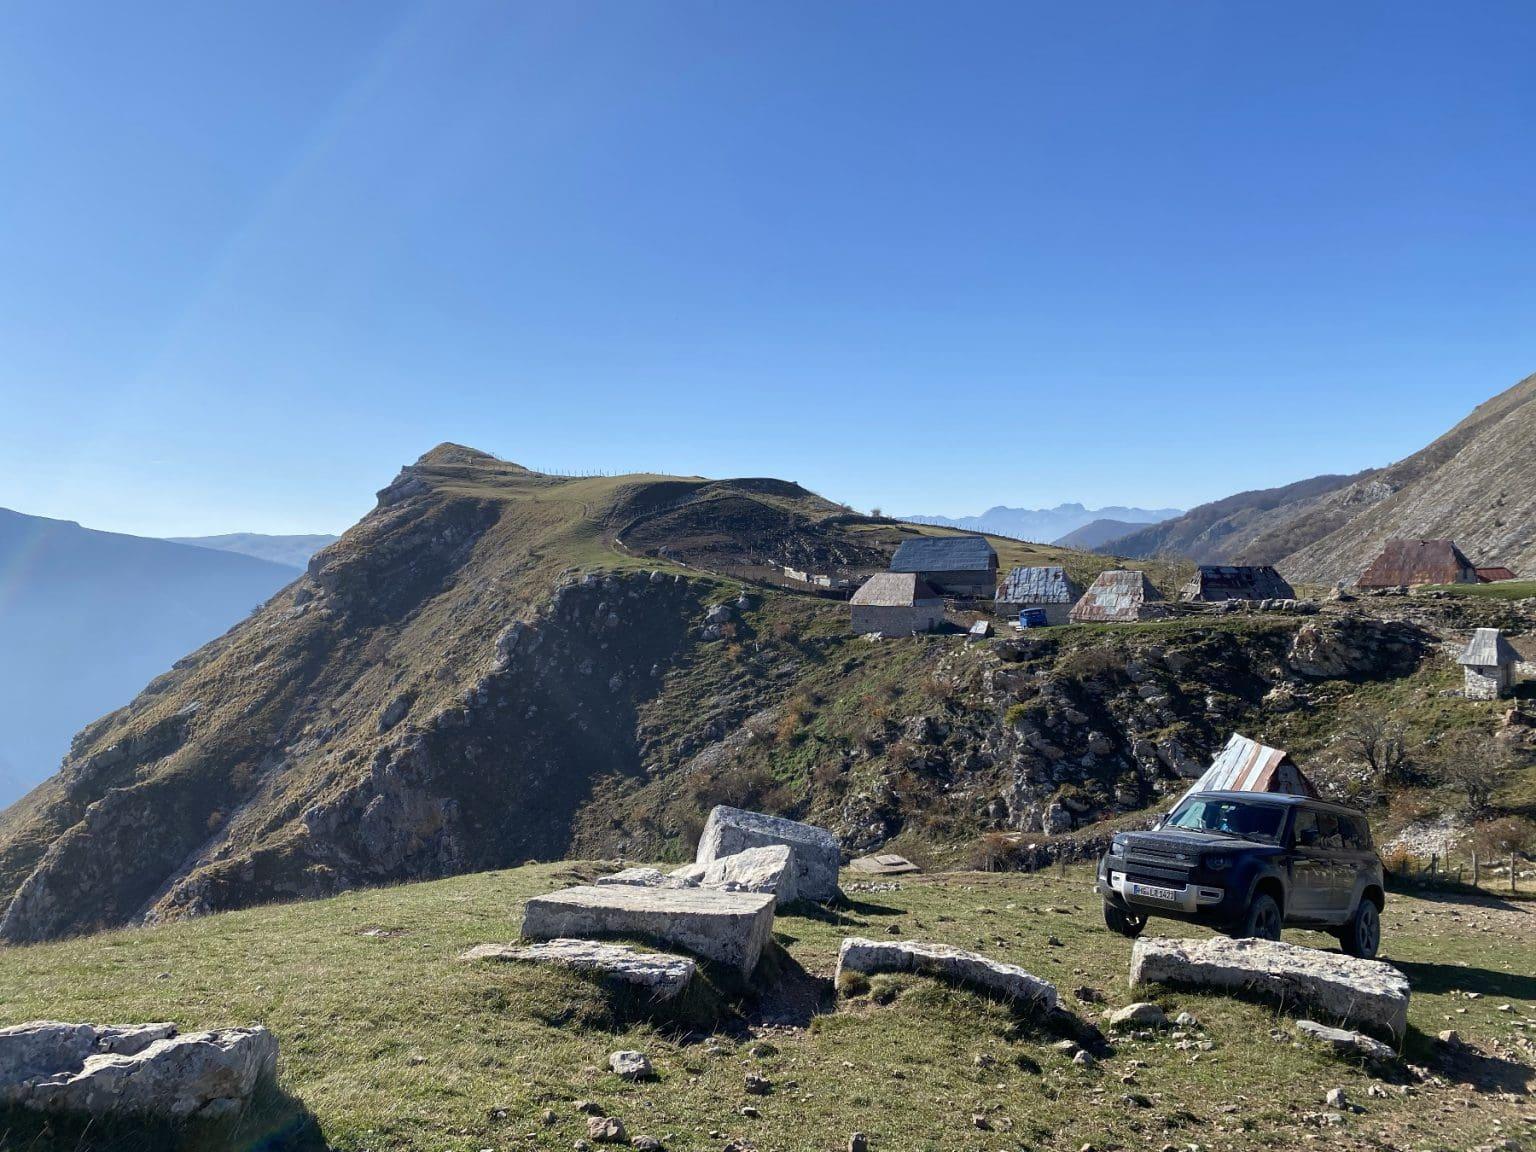 So close to heaven - In The Mountain Village Lukomir 12